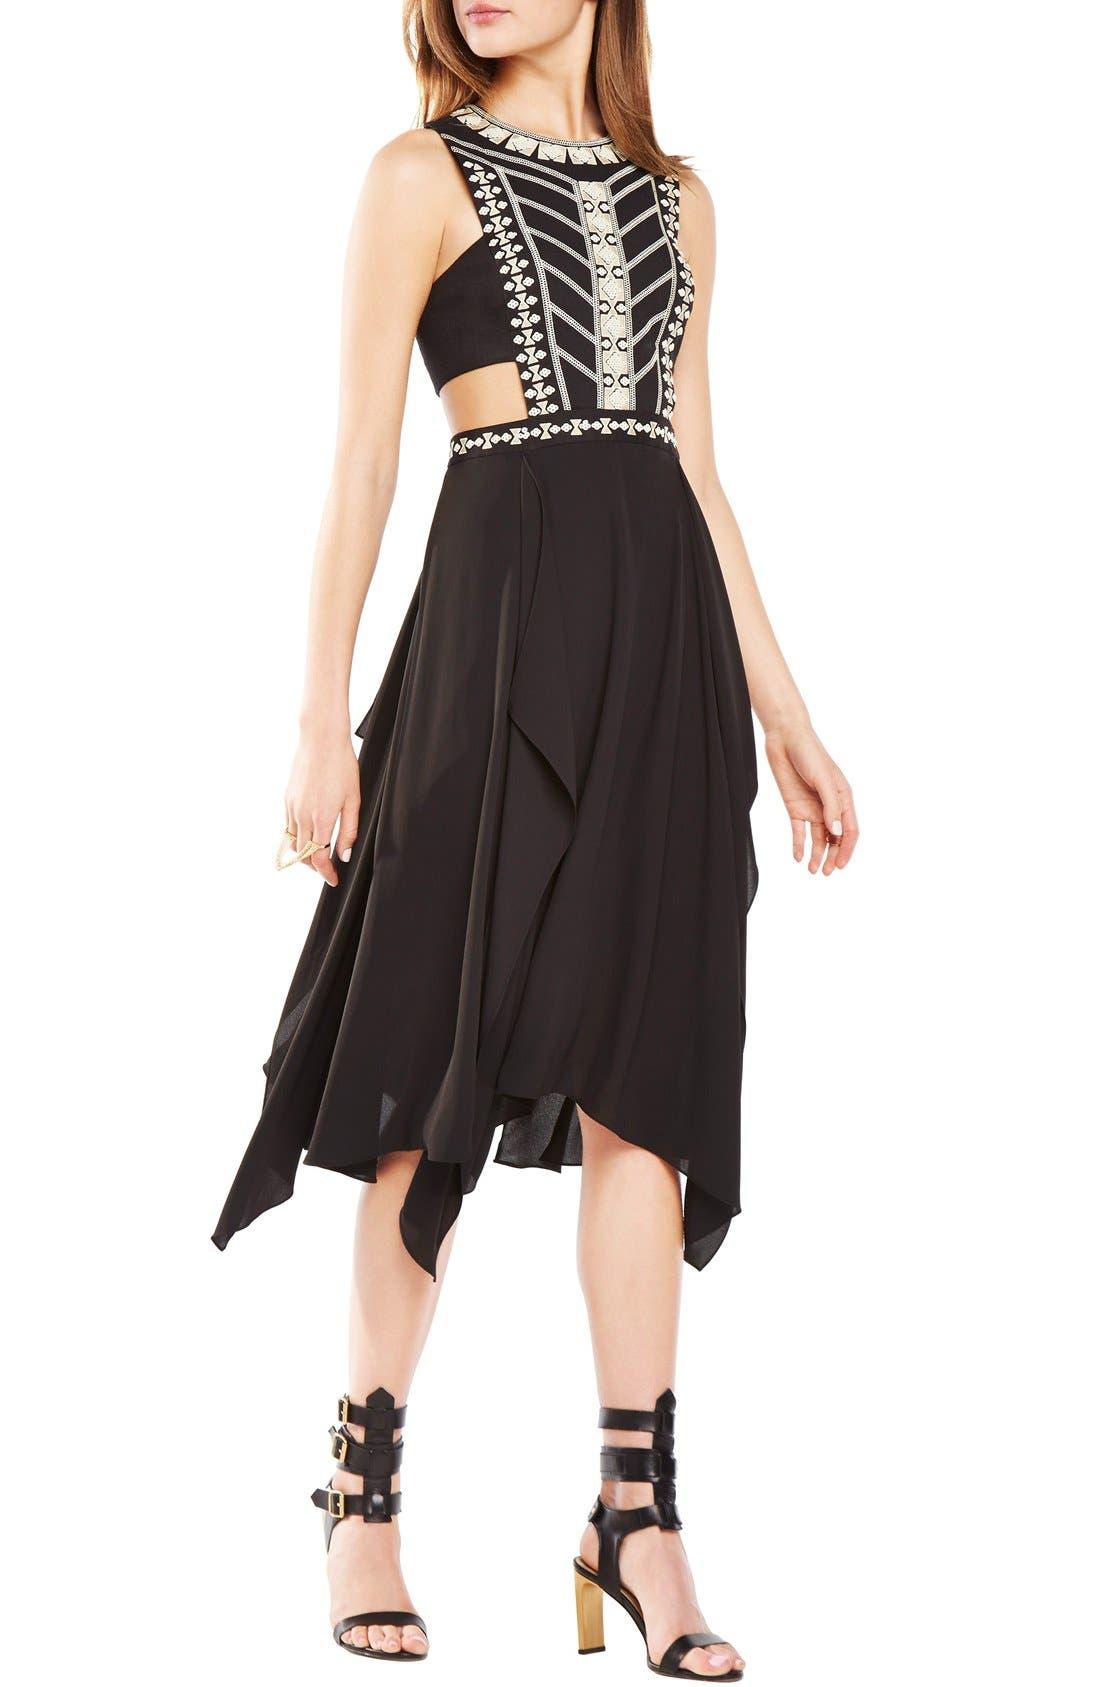 Main Image - BCBGMAXAZRIA 'Adelia' Cutout Embellished Georgette Midi Dress